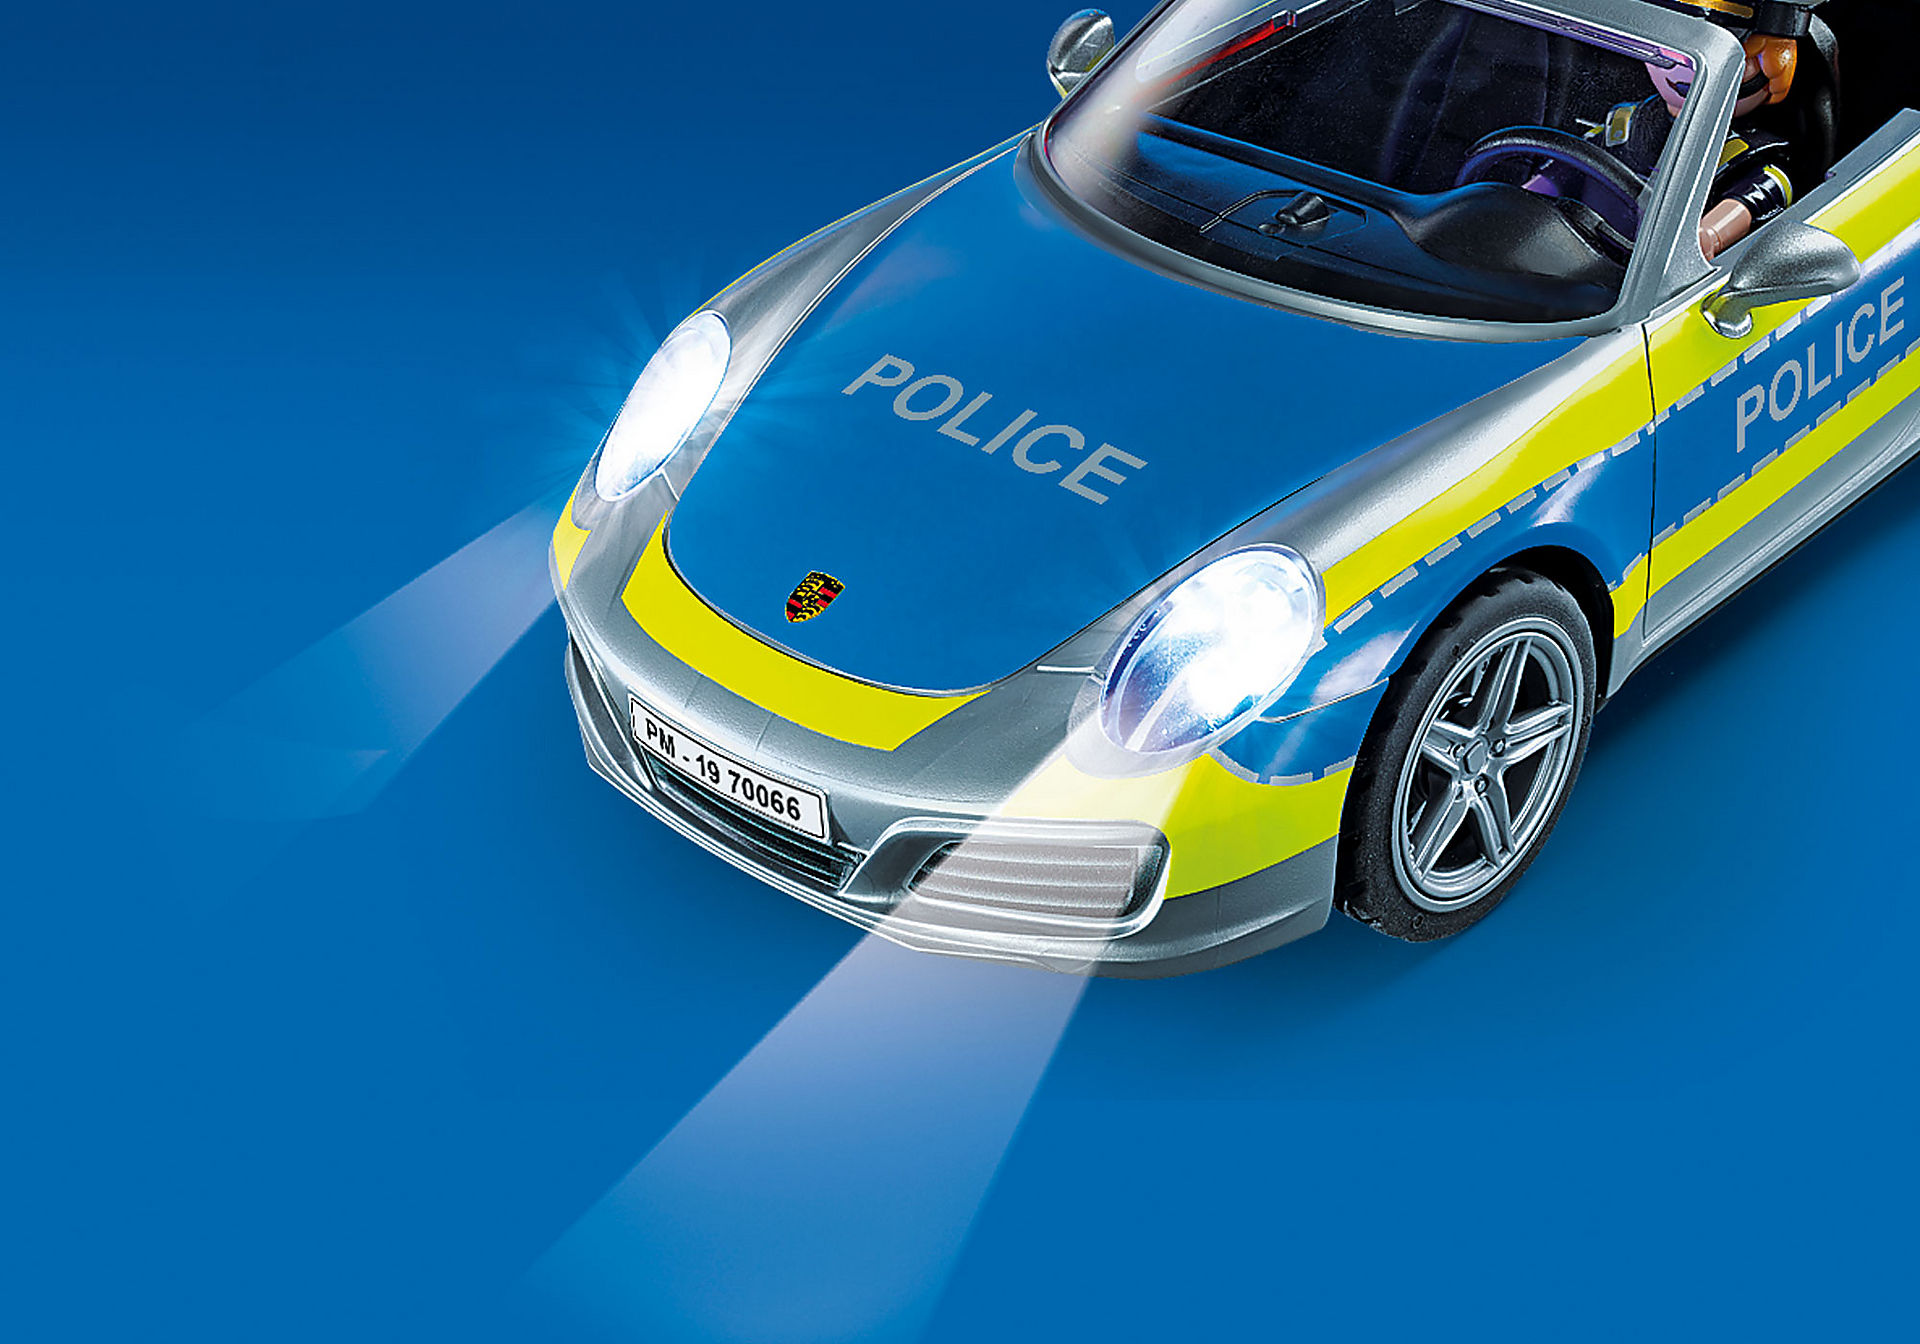 70066 Porsche 911 Carrera 4S Policja zoom image5